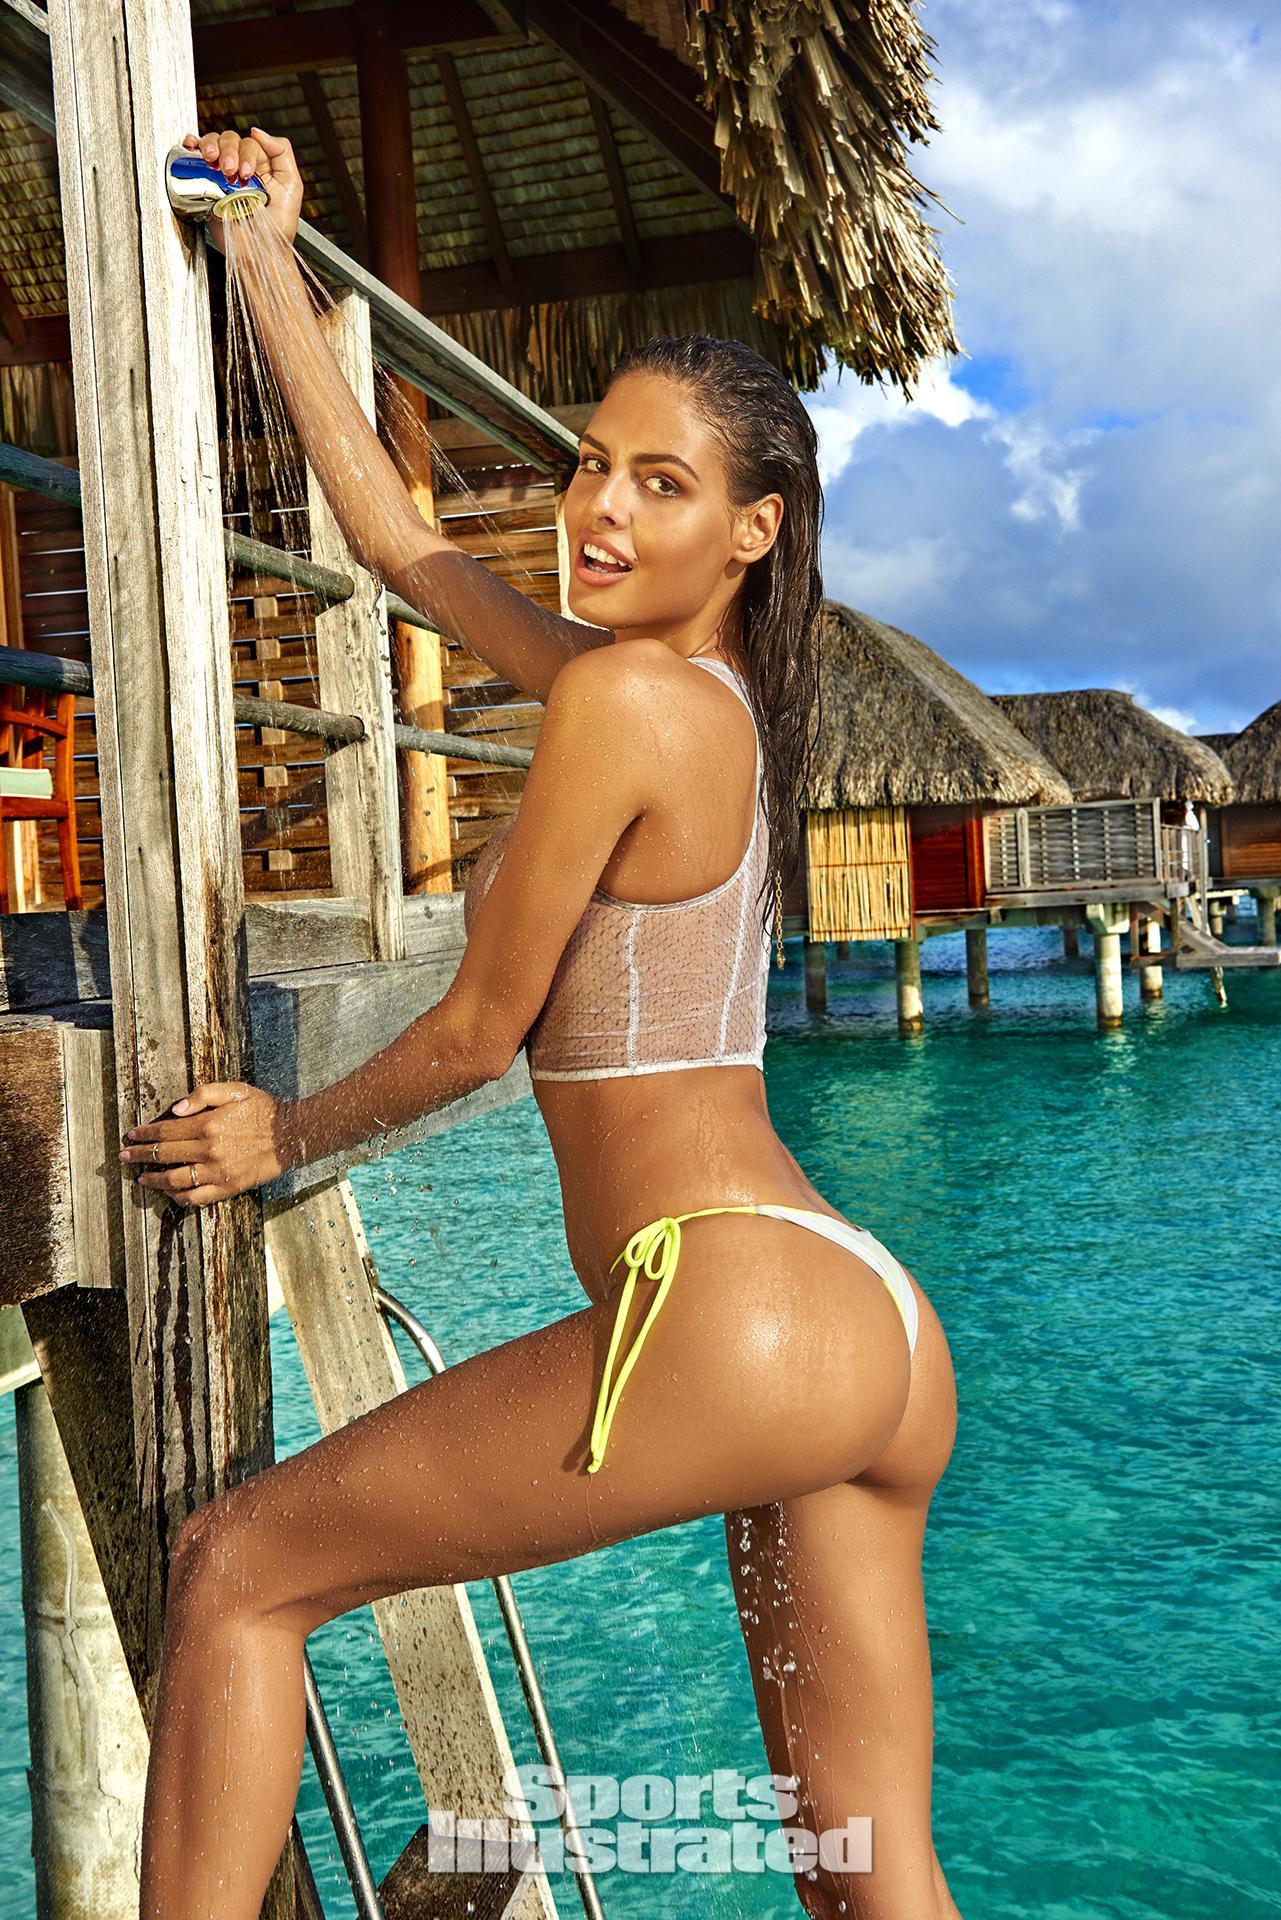 f2aa7375eaa0b Bo Krsmanovic Sports Illustrated Swimsuit 2016 19 GotCeleb 1281x1920